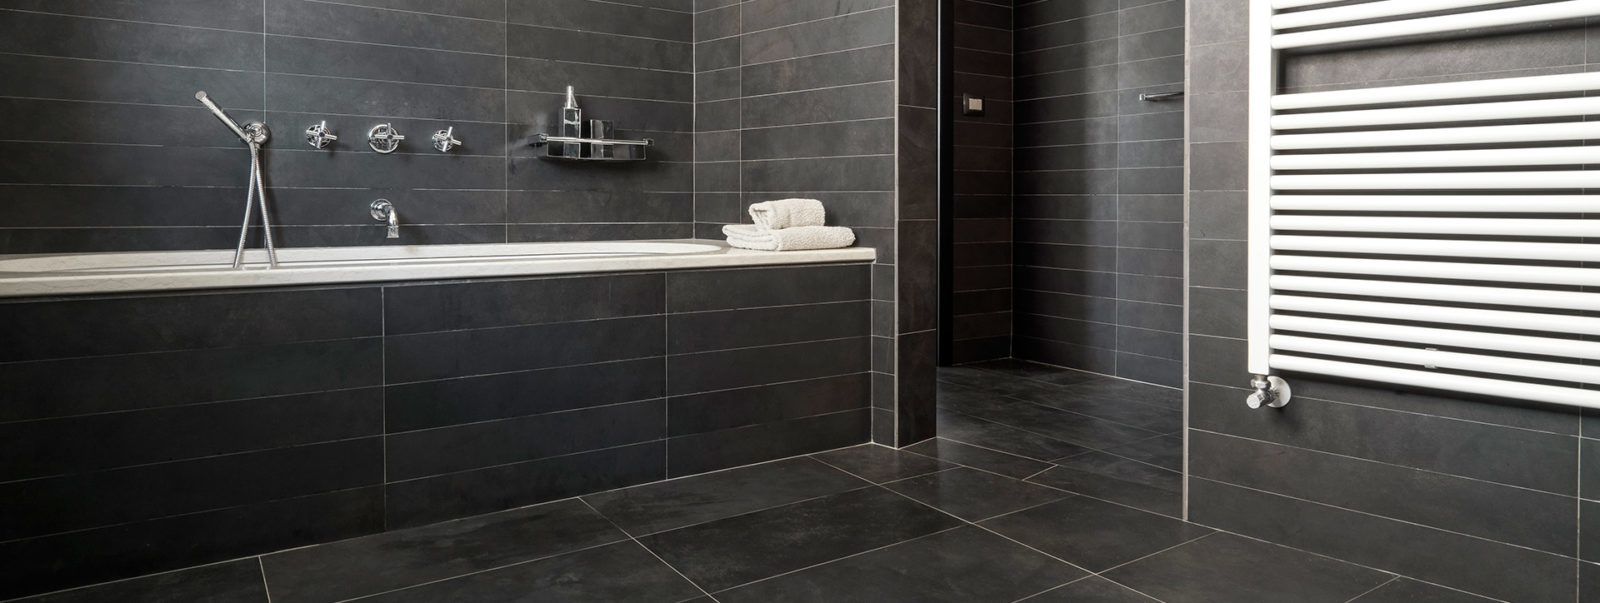 Bathroom Remodel in Las Vegas, Spring Valley NV, Henderson NV